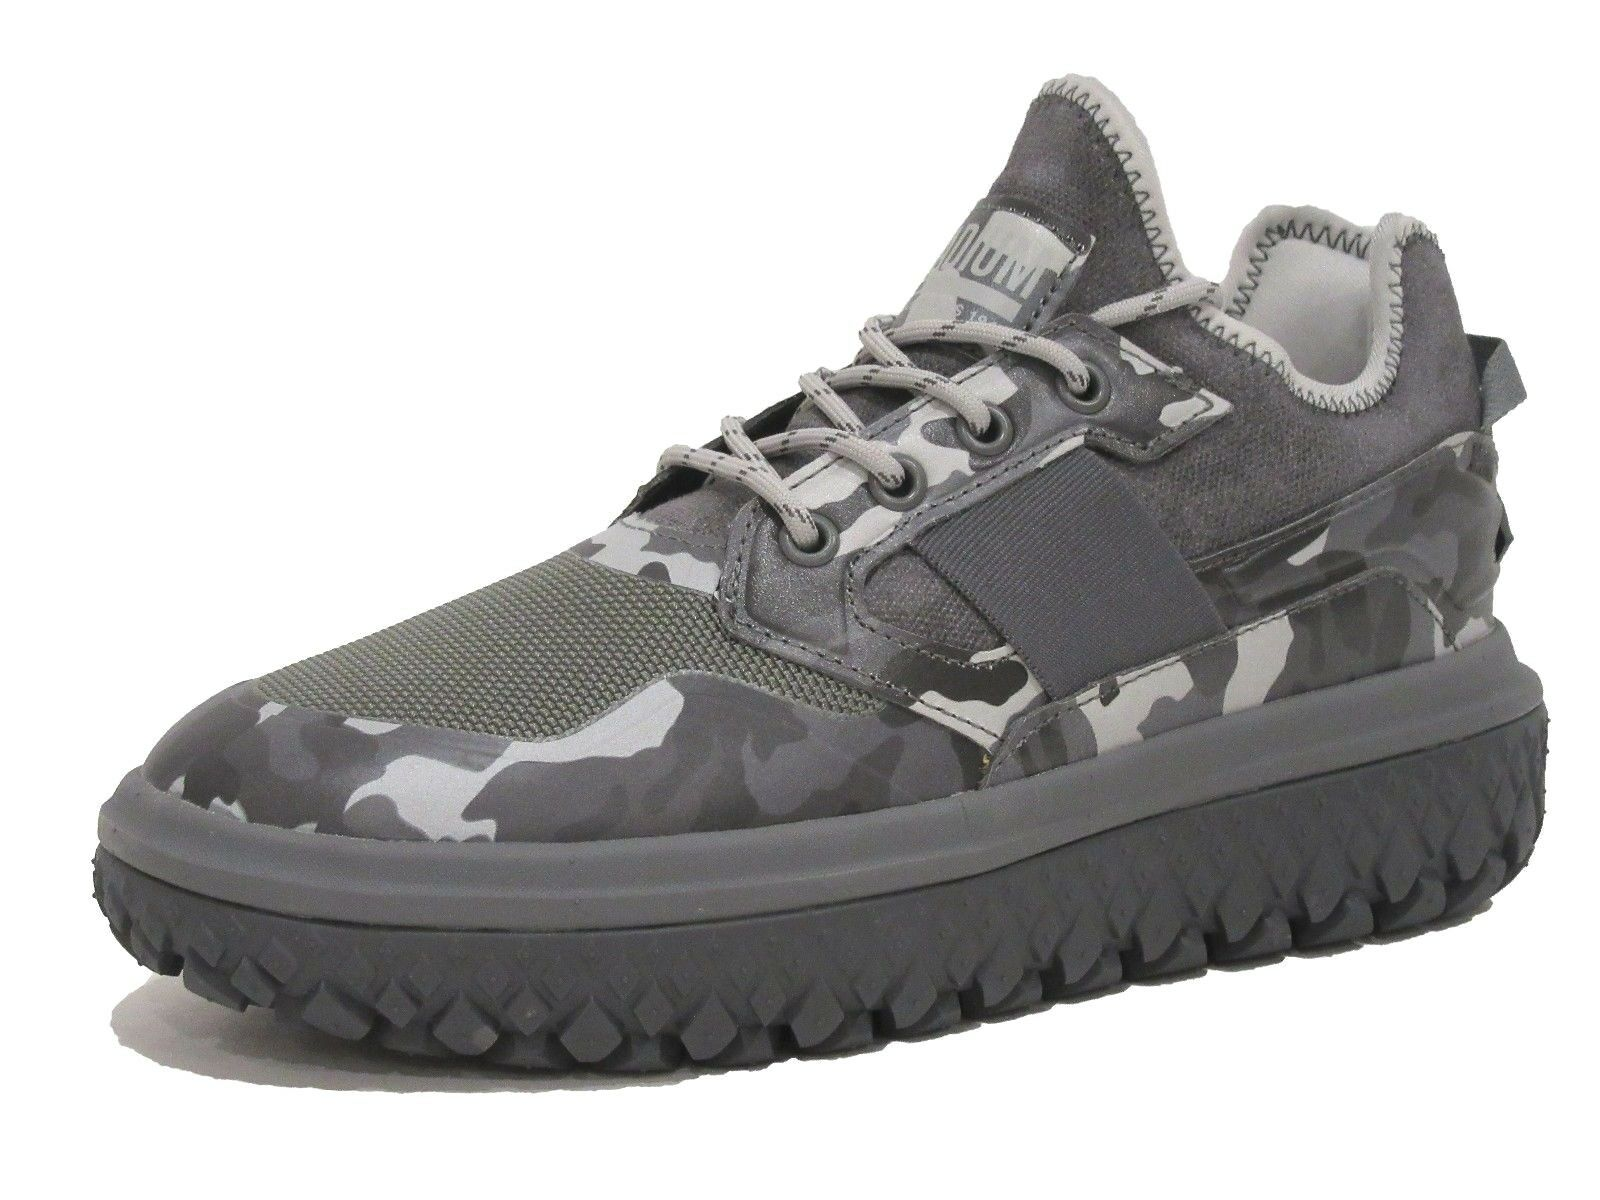 Palladium. Men's Crushion SCRMBL Fast Fashion shoes